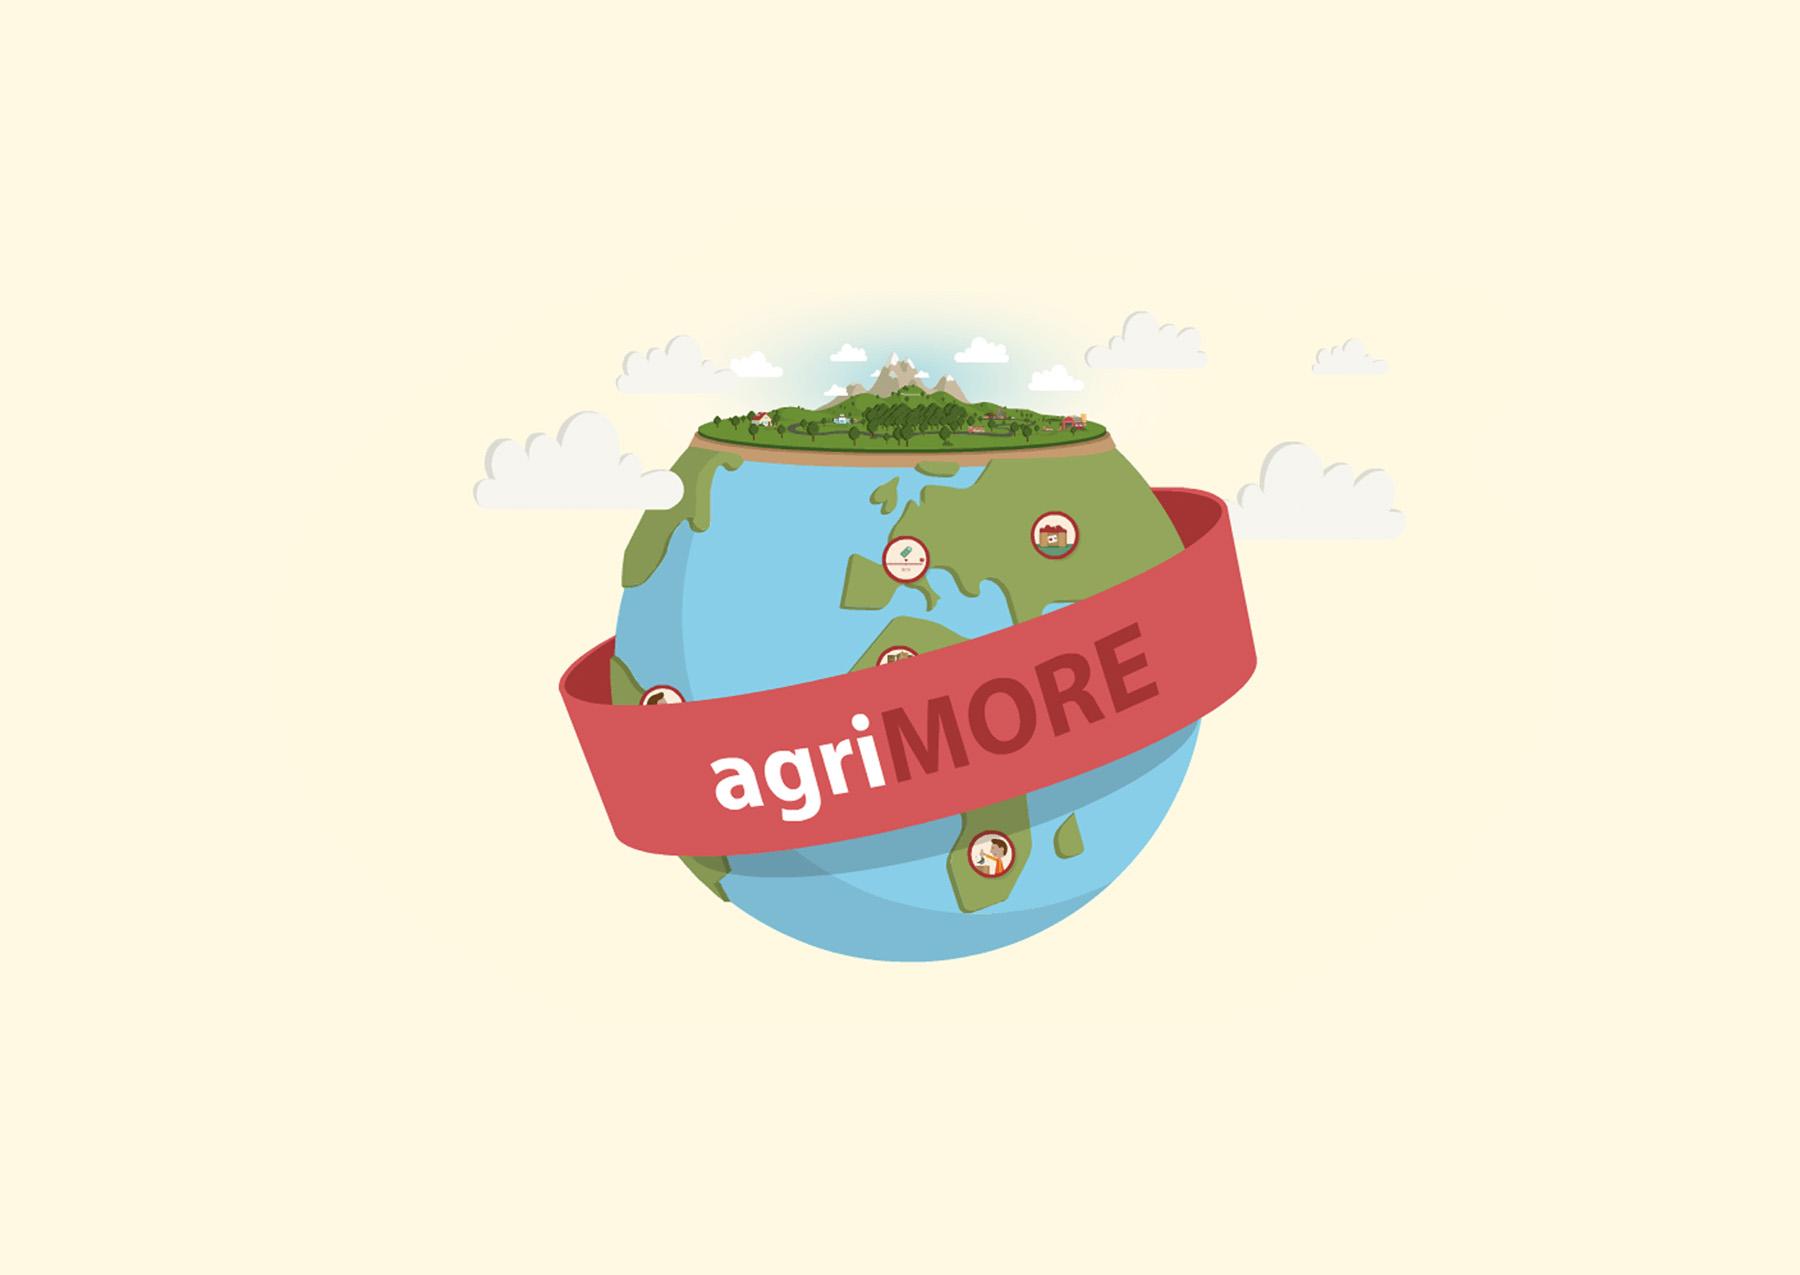 Agrimore.jpg